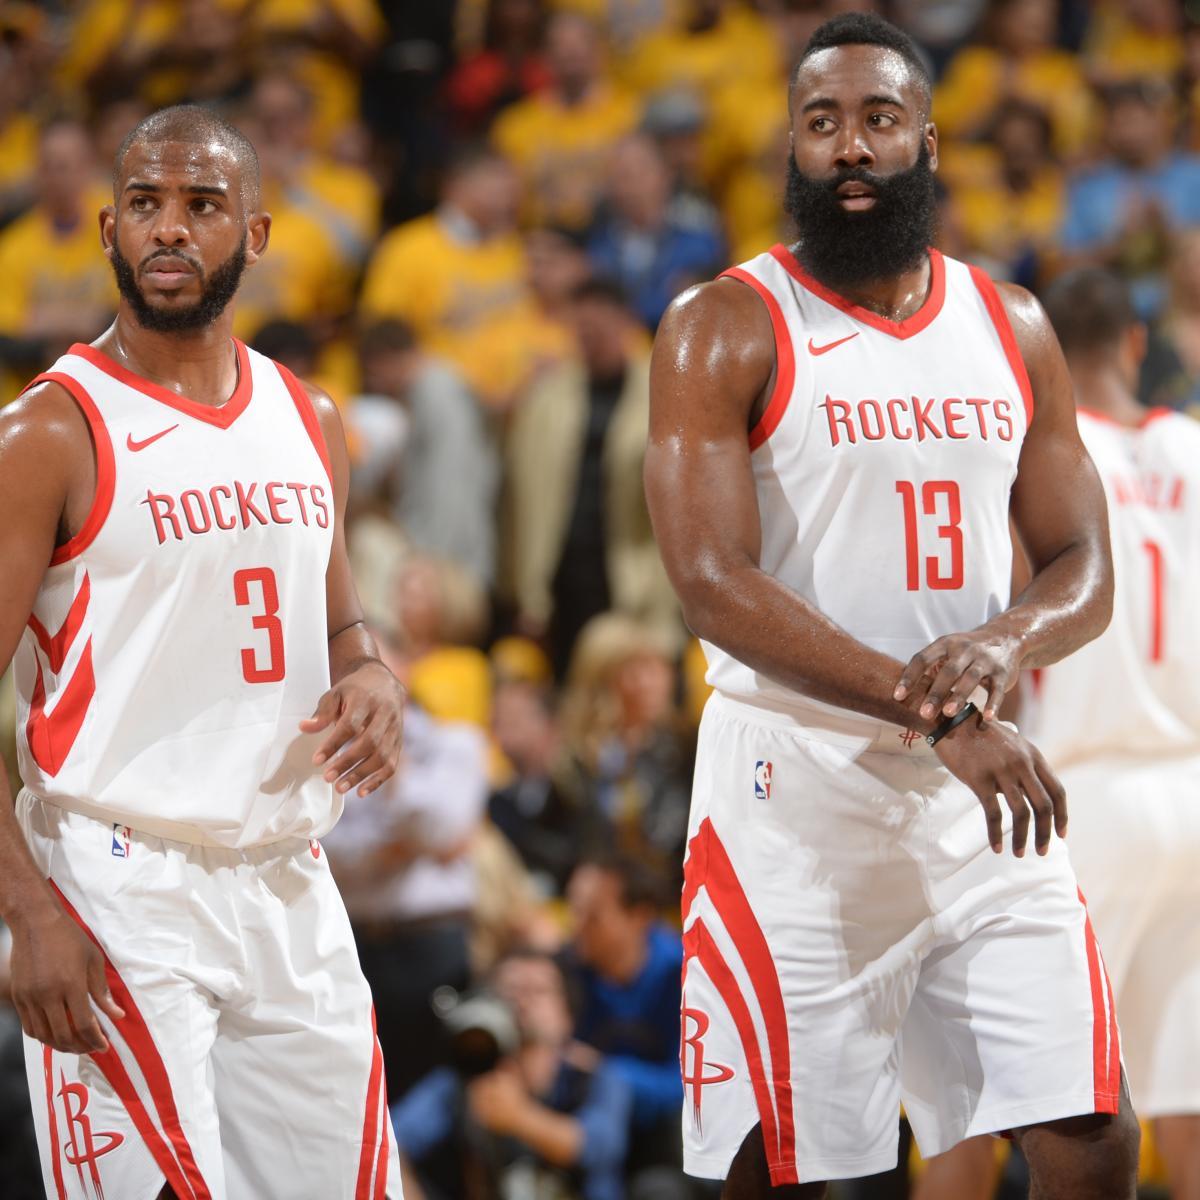 Rockets Vs Warriors James Harden: James Harden, Chris Paul Carry Rockets To Crucial Game 4